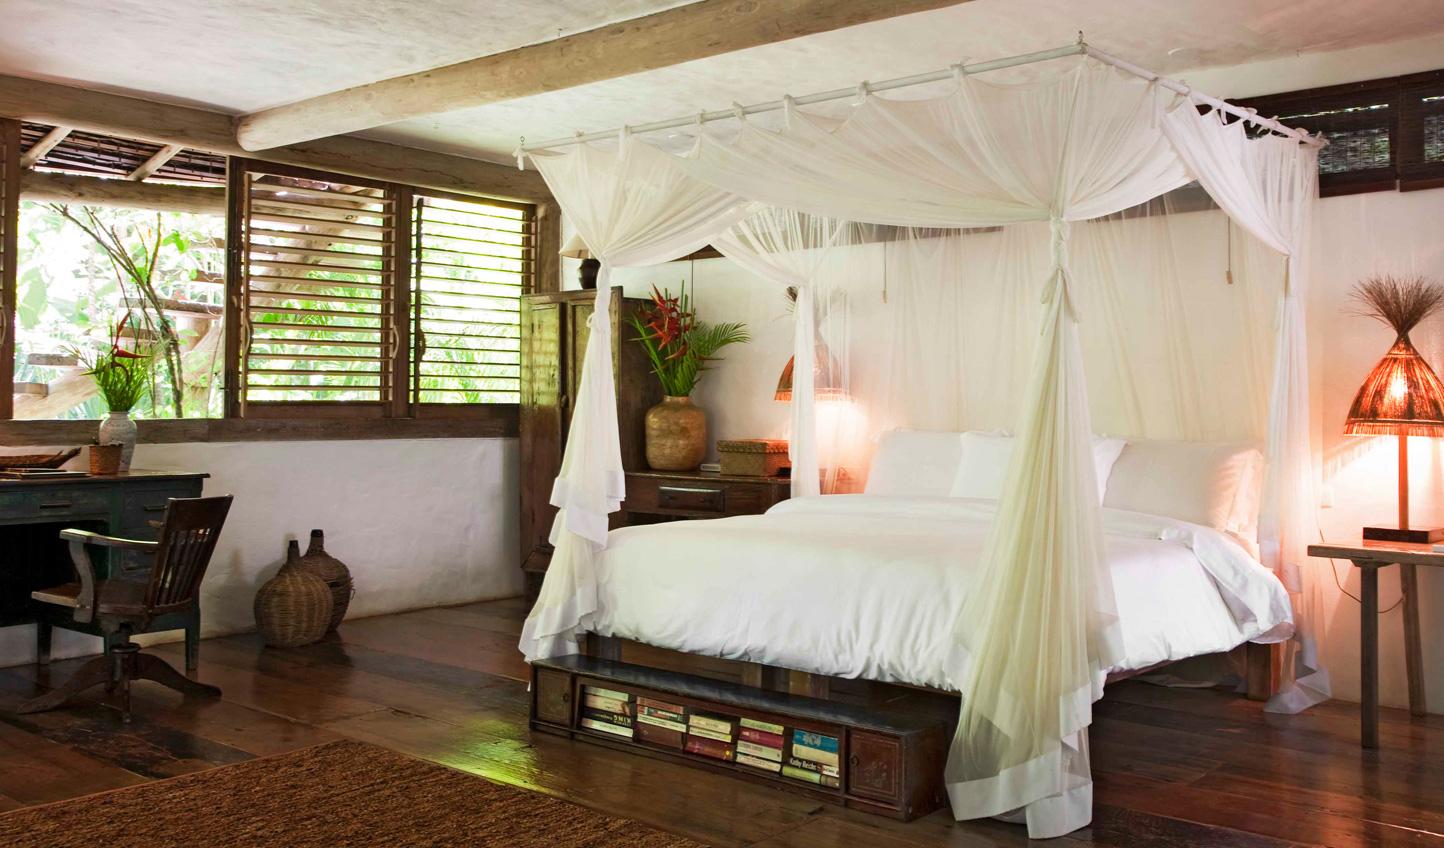 Beautiful design creates a peaceful hideaway